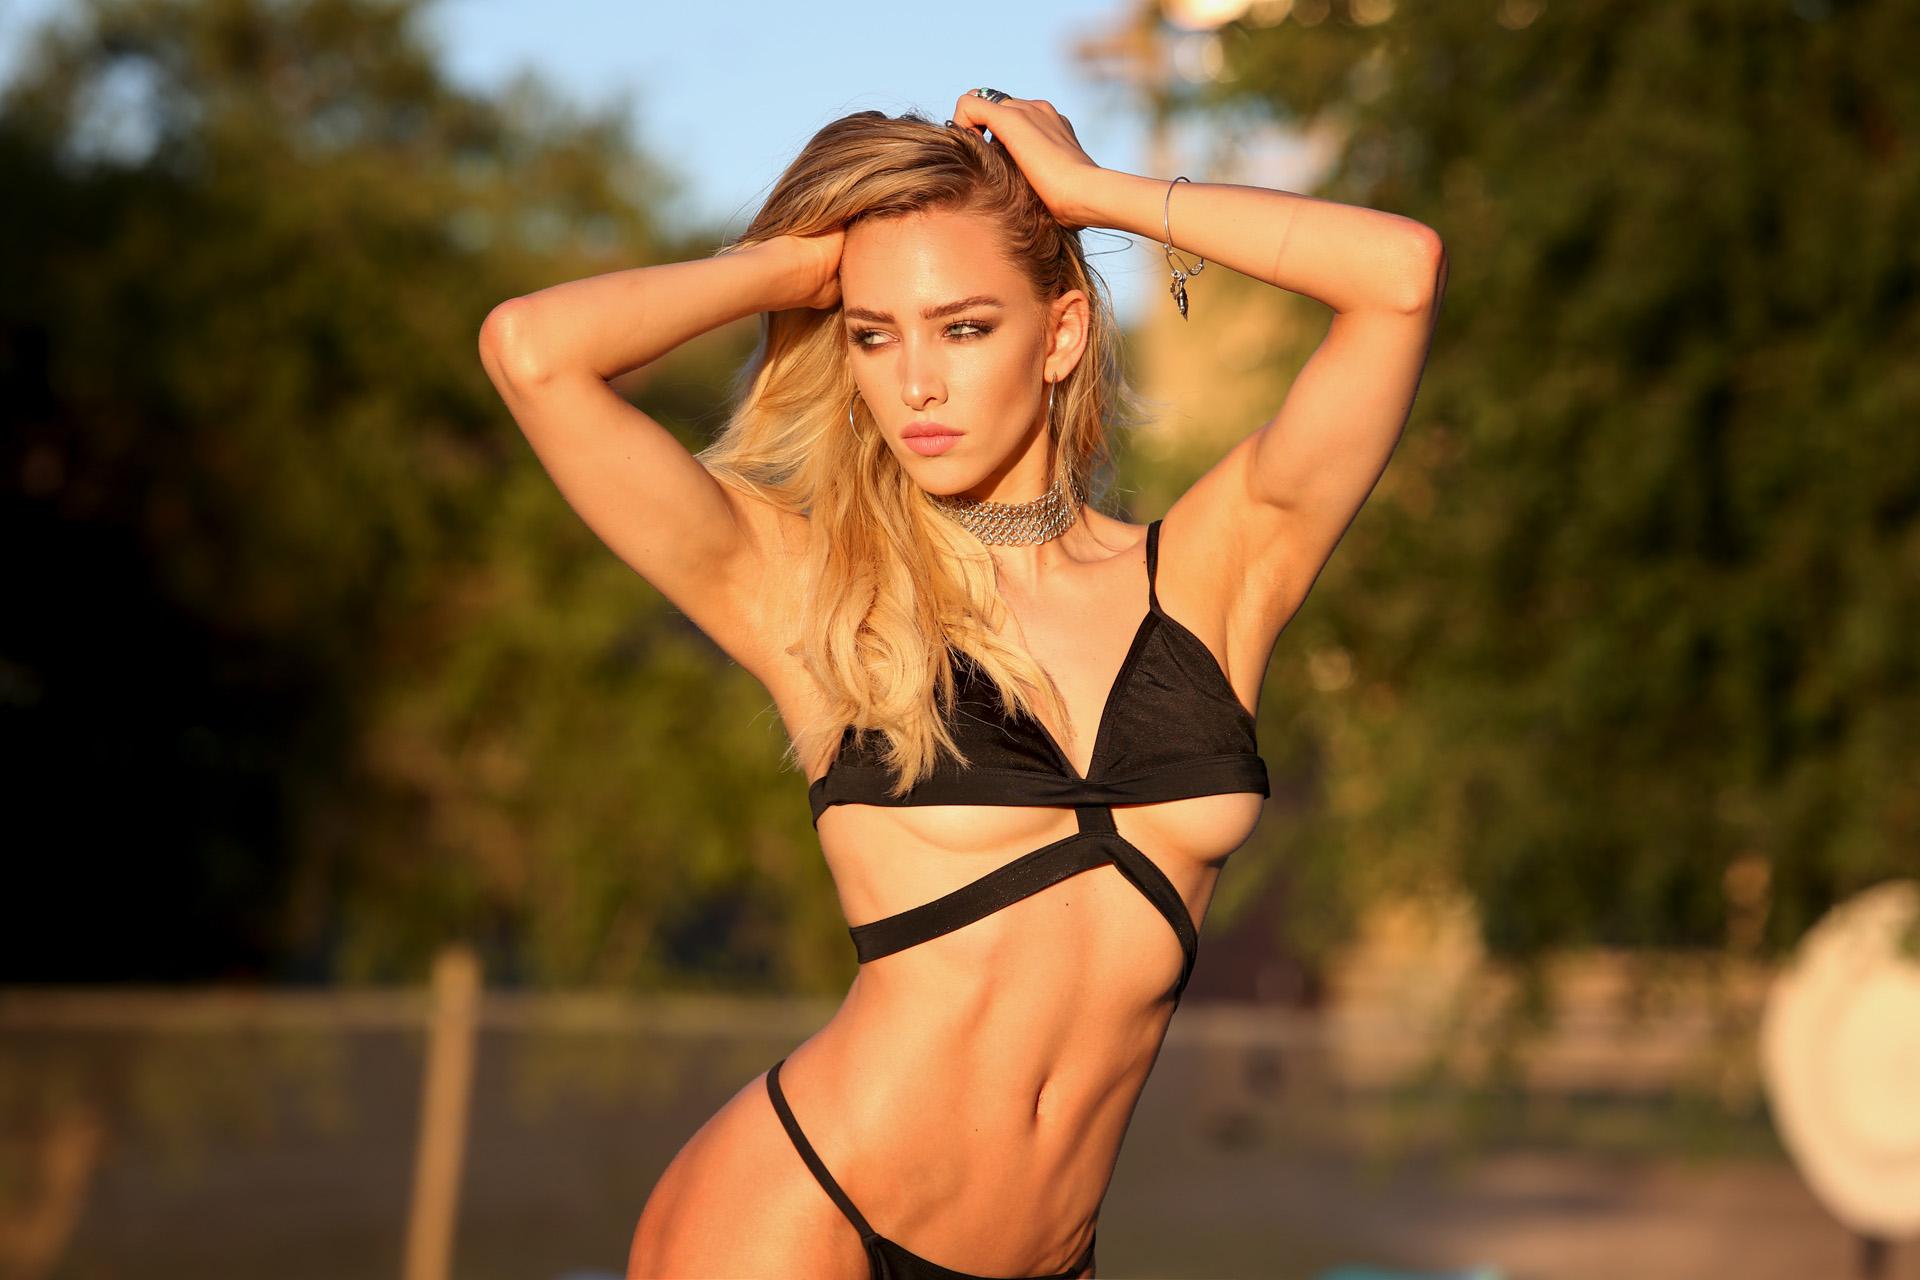 2019 Belen Pouchan nudes (44 photos), Sexy, Paparazzi, Boobs, swimsuit 2019